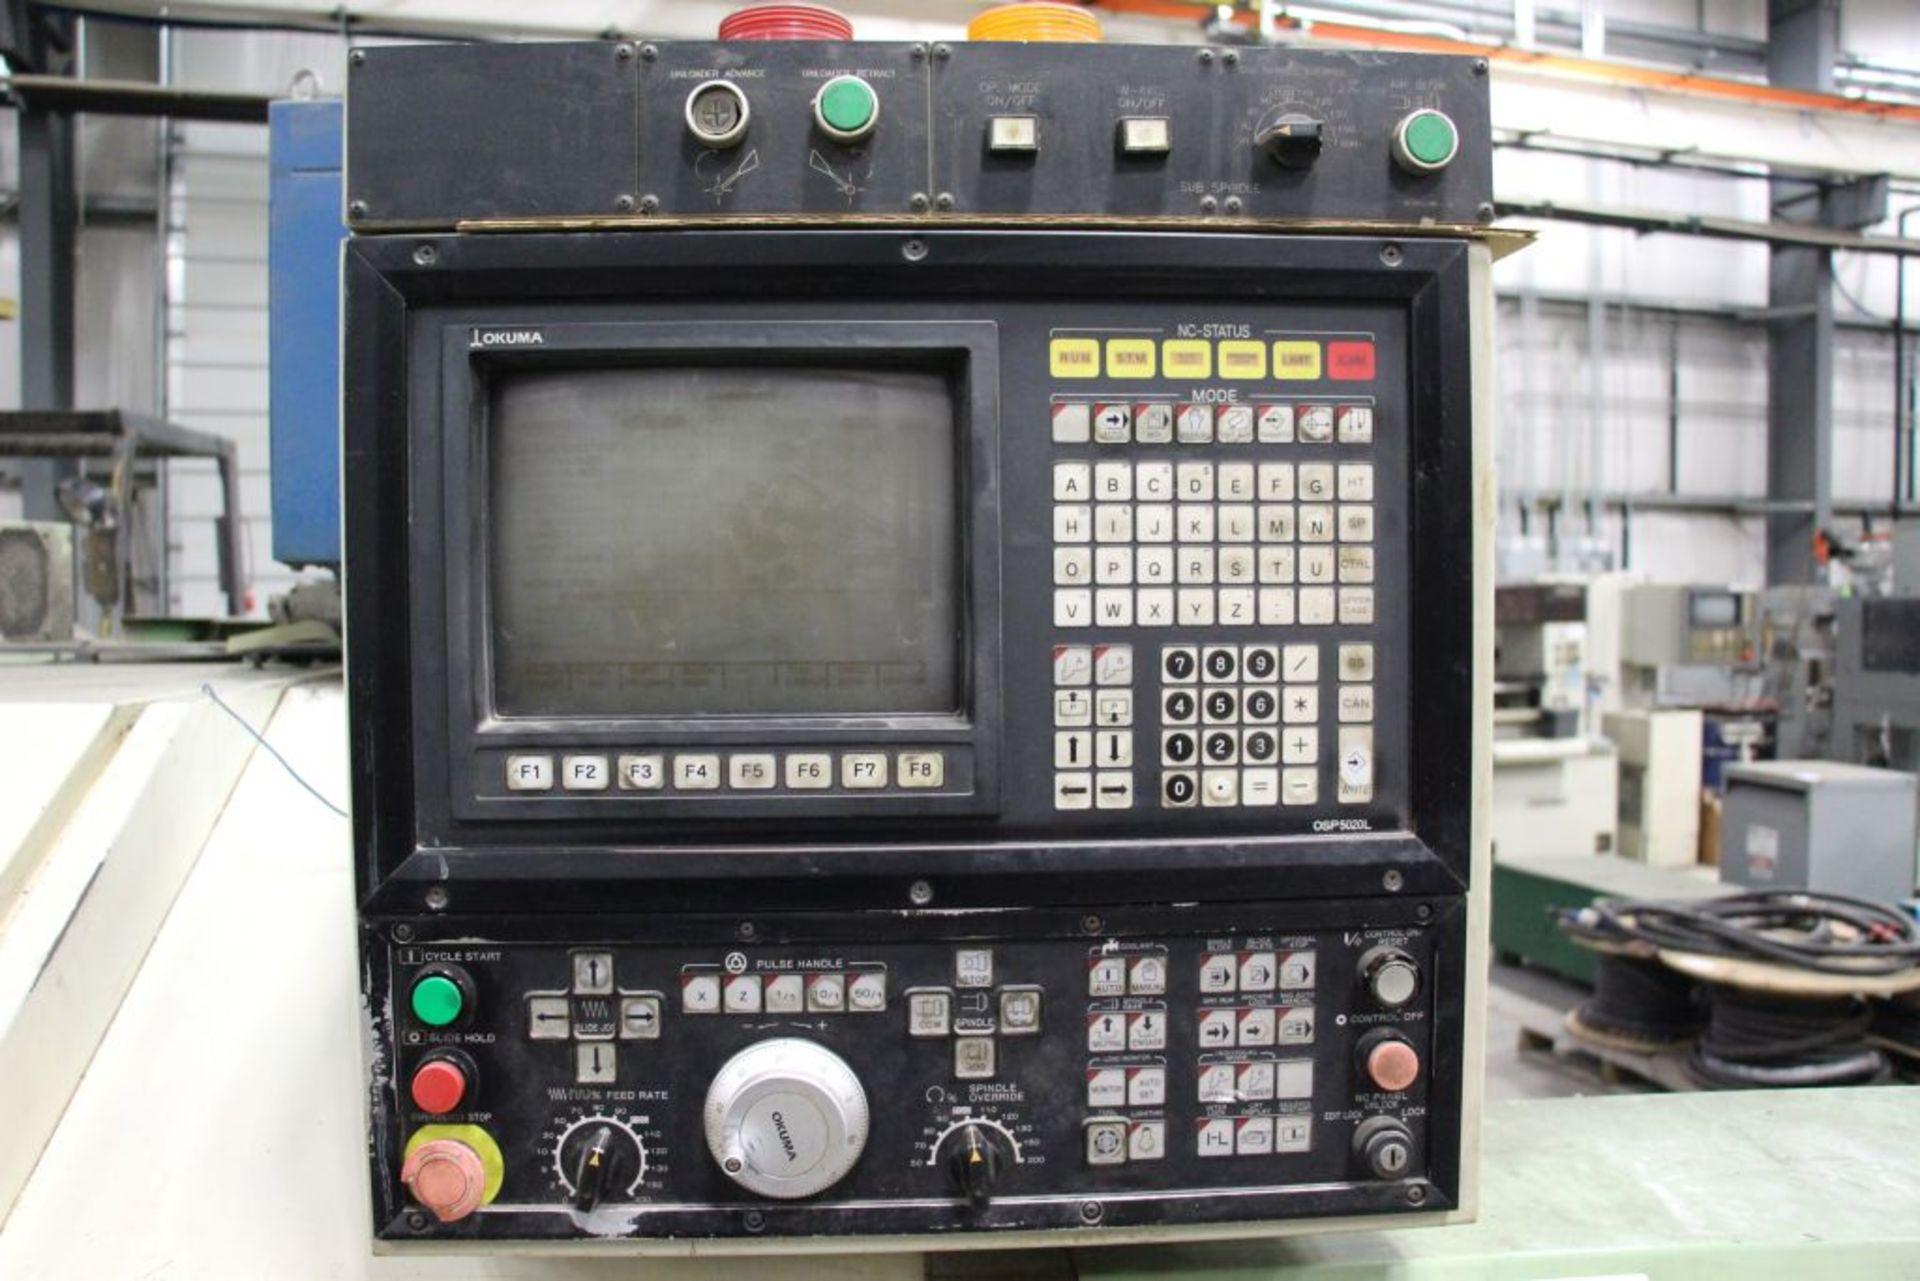 Lot 1 - Okuma Cadet W CNC Lathe, model LNC - 8W, serial number - 06030083, 220V / 3 Phase